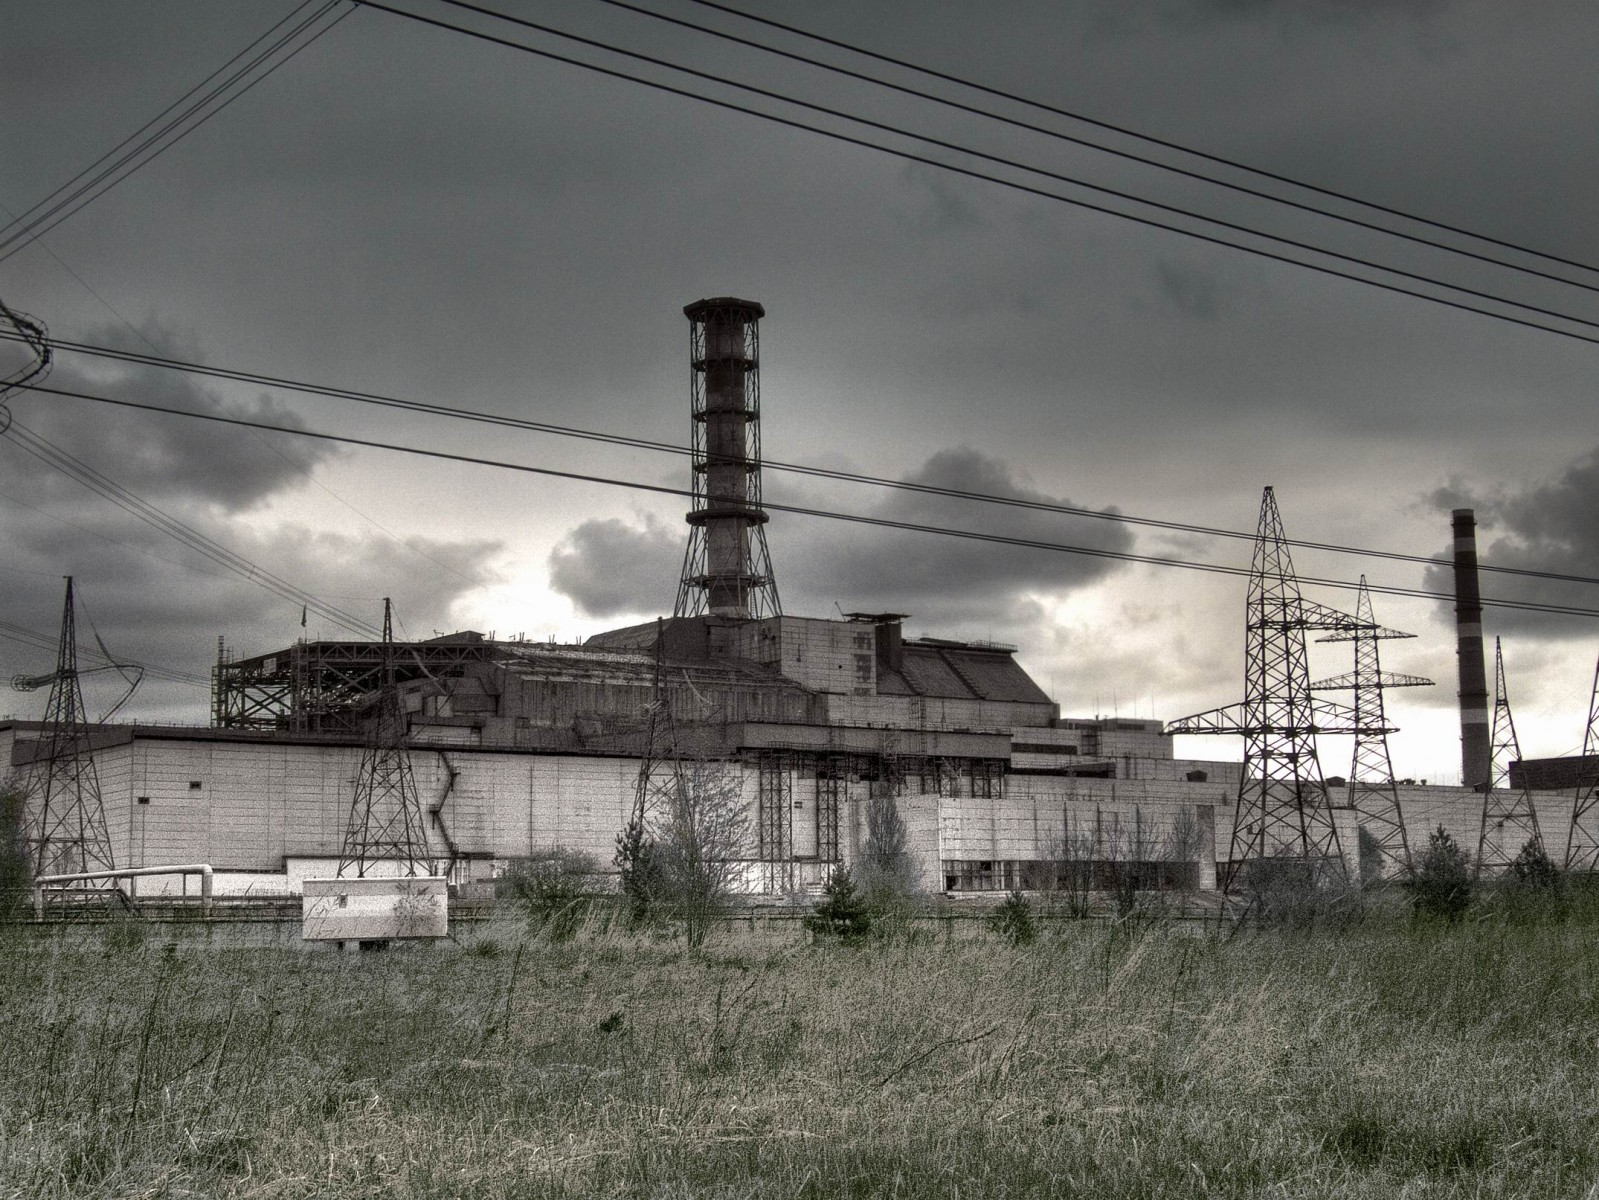 avariya-v-chernobile1 26 квітня День пам'яті Чорнобильської трагедії